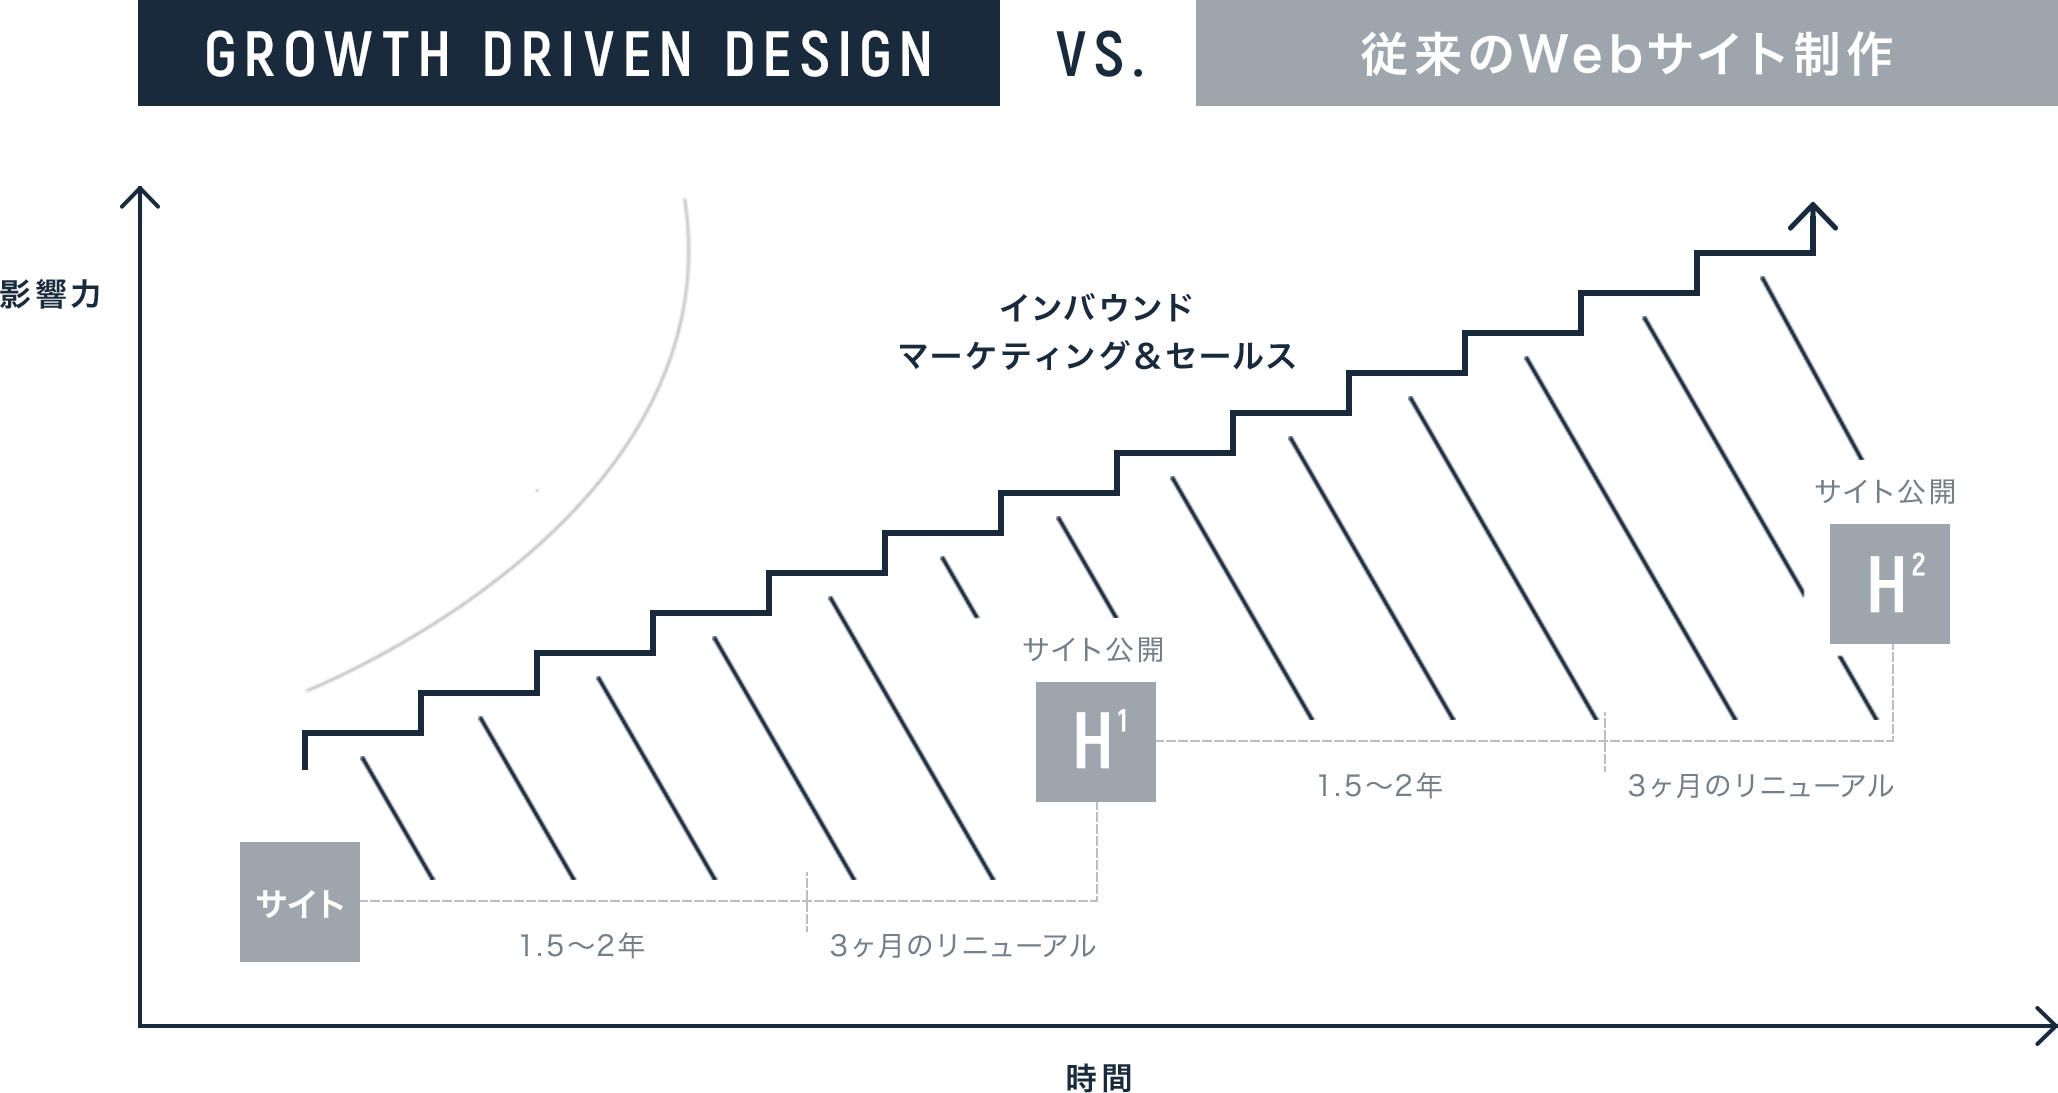 Webサイト構築の流れ